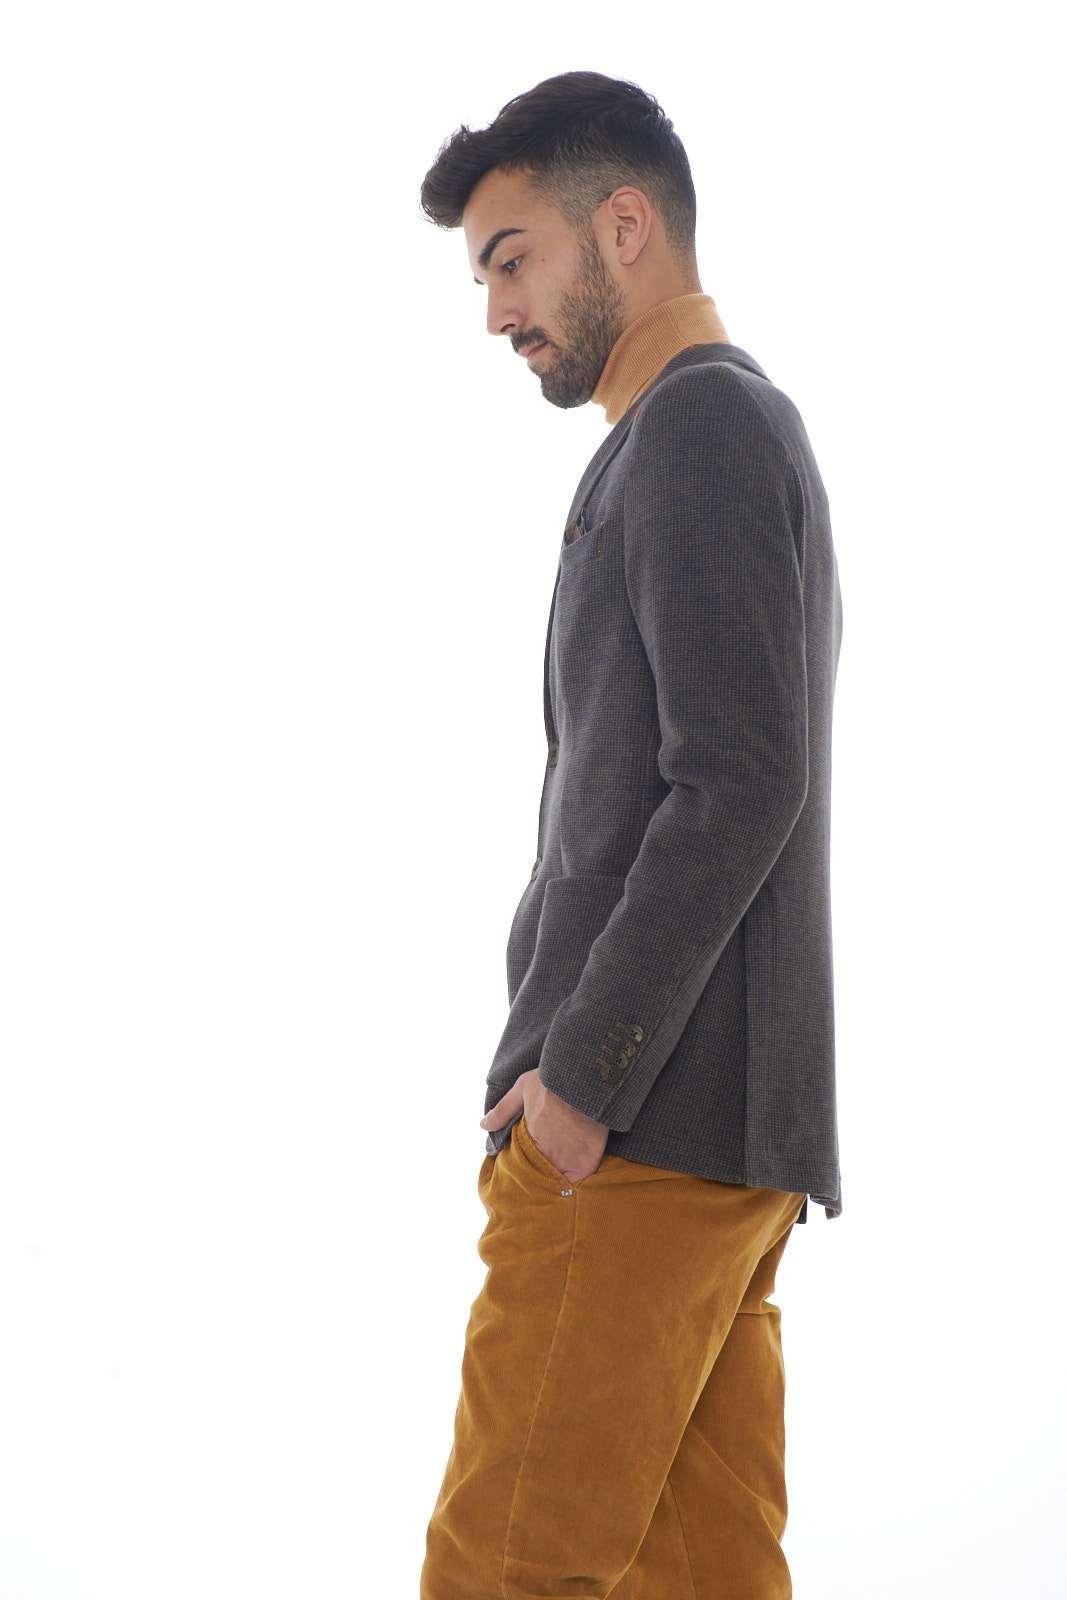 https://www.parmax.com/media/catalog/product/a/i/AI-outlet_parmax-giacca-uomo-Manuel-Ritz-2732G2442T%20193515-B.jpg